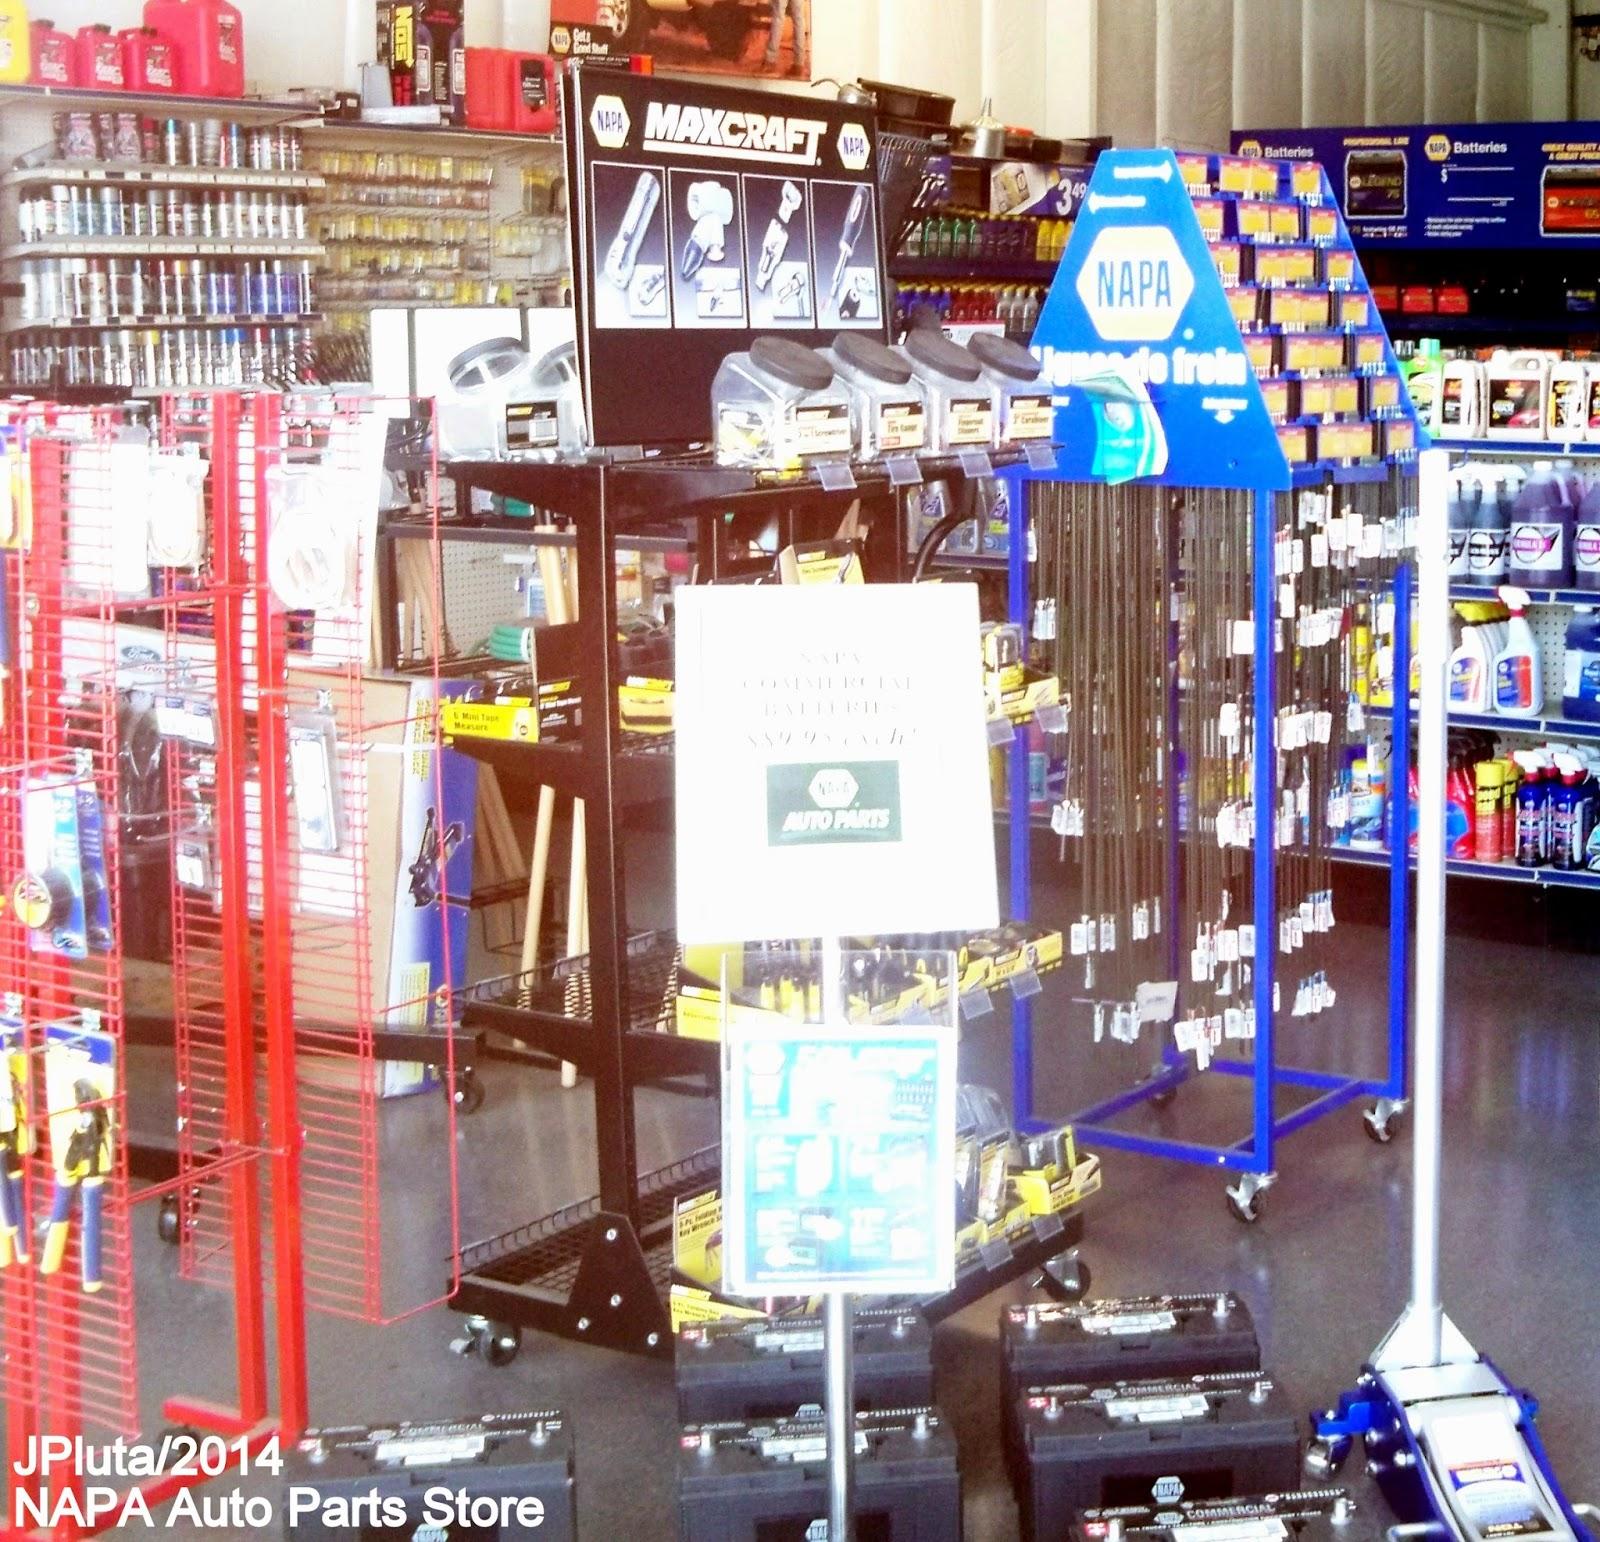 Parts Supply Store: MIAMI FLORIDA Dade County South Beach Hotel Restaurant